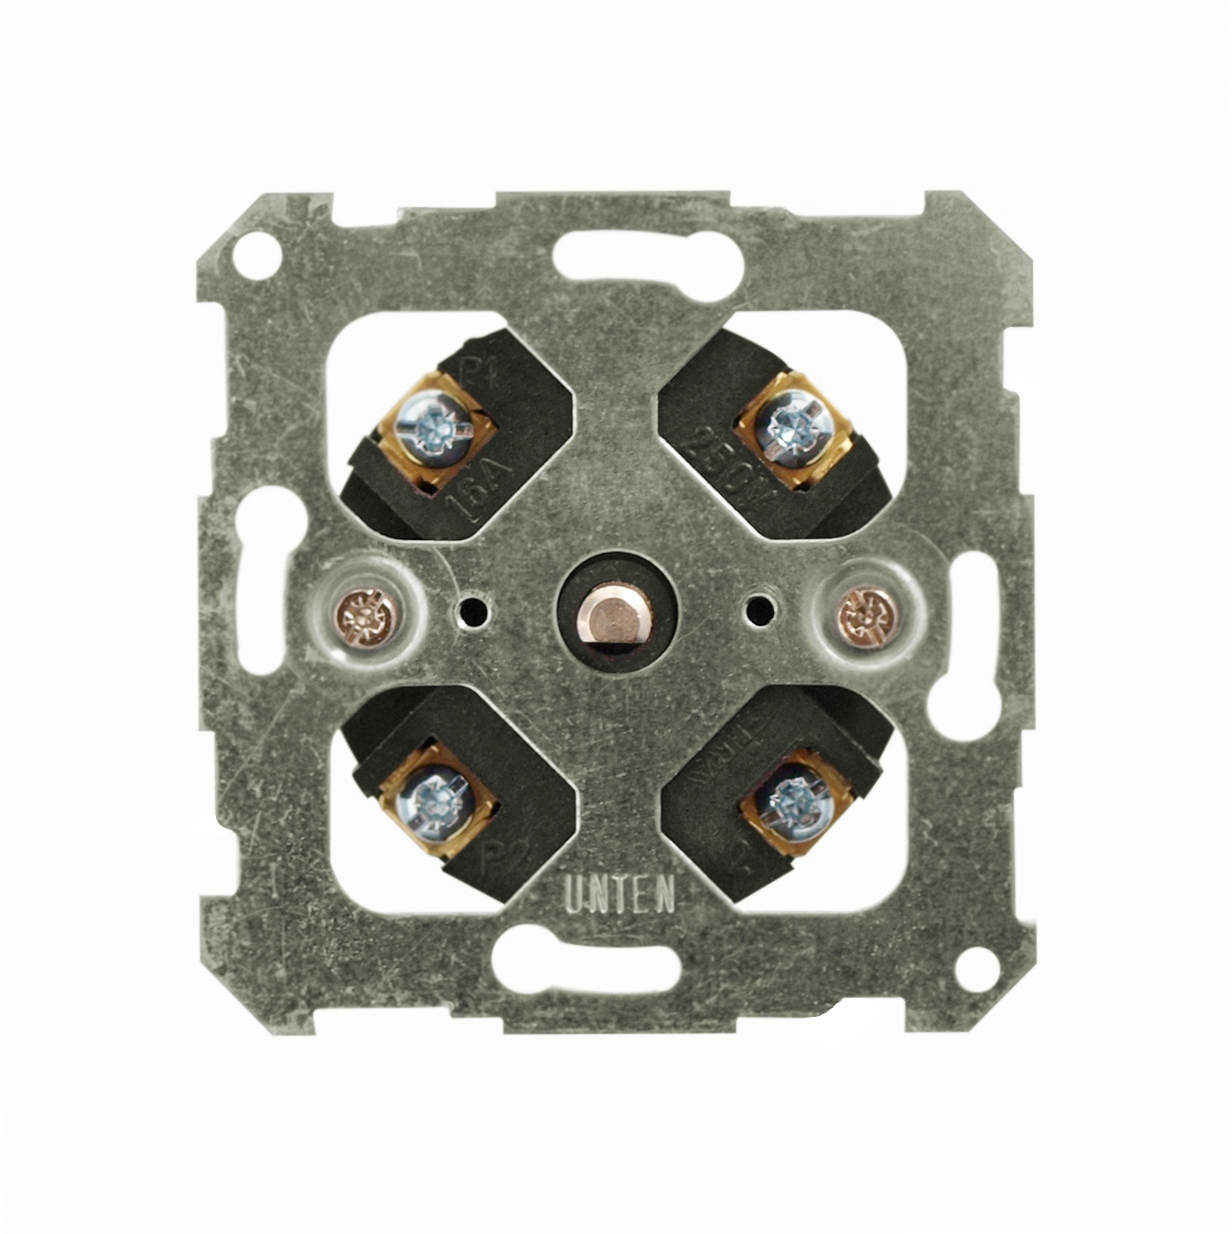 1 Stk UP-Zeitschalter mechanisch, 2-polig, 120 min EL177040--